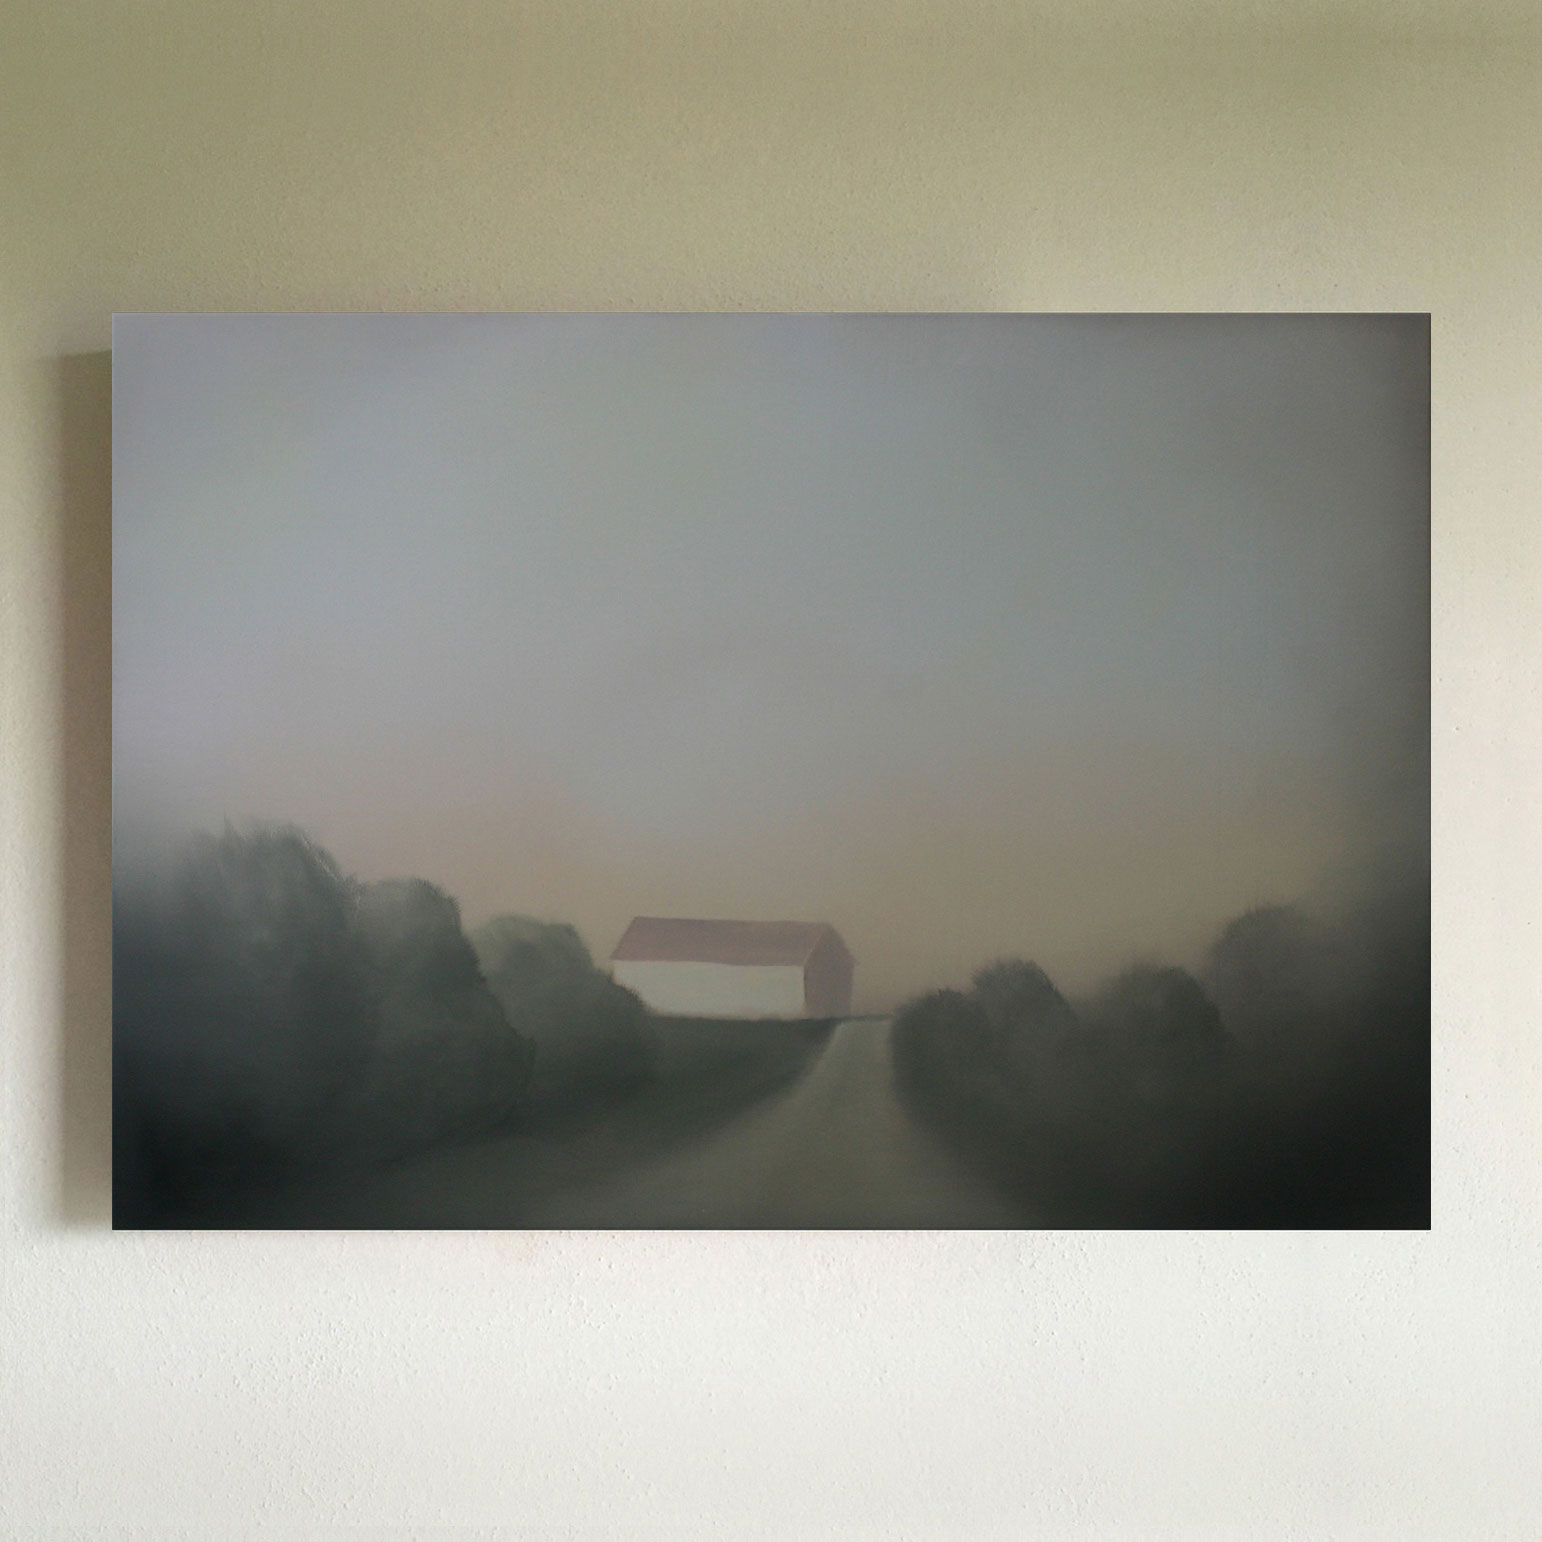 T#82-2011, oil on canvas, 70x100cm, priv. coll.